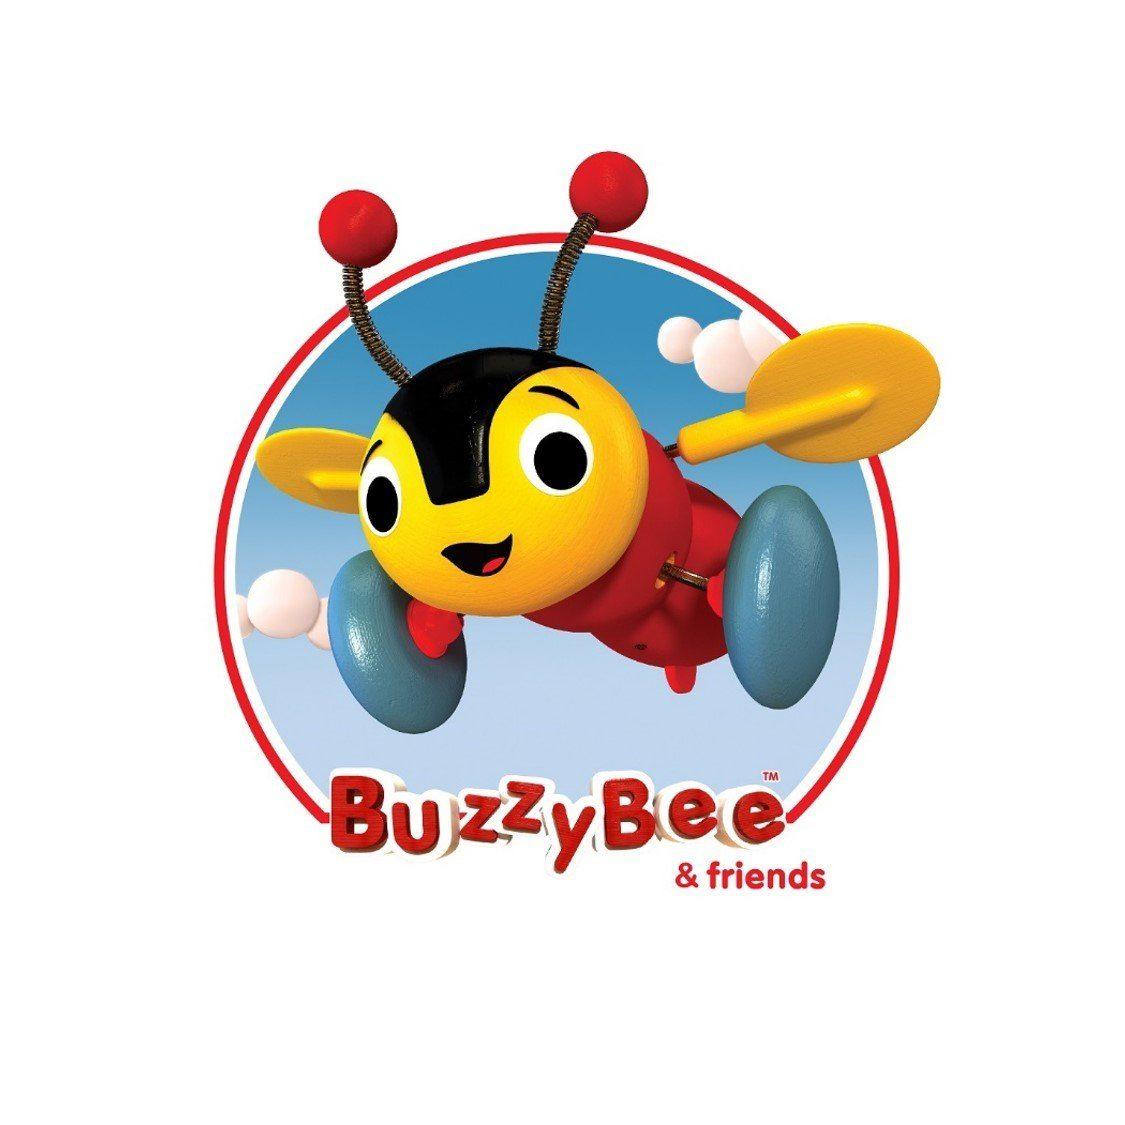 Wholesale Buzzy Bee Merchandise